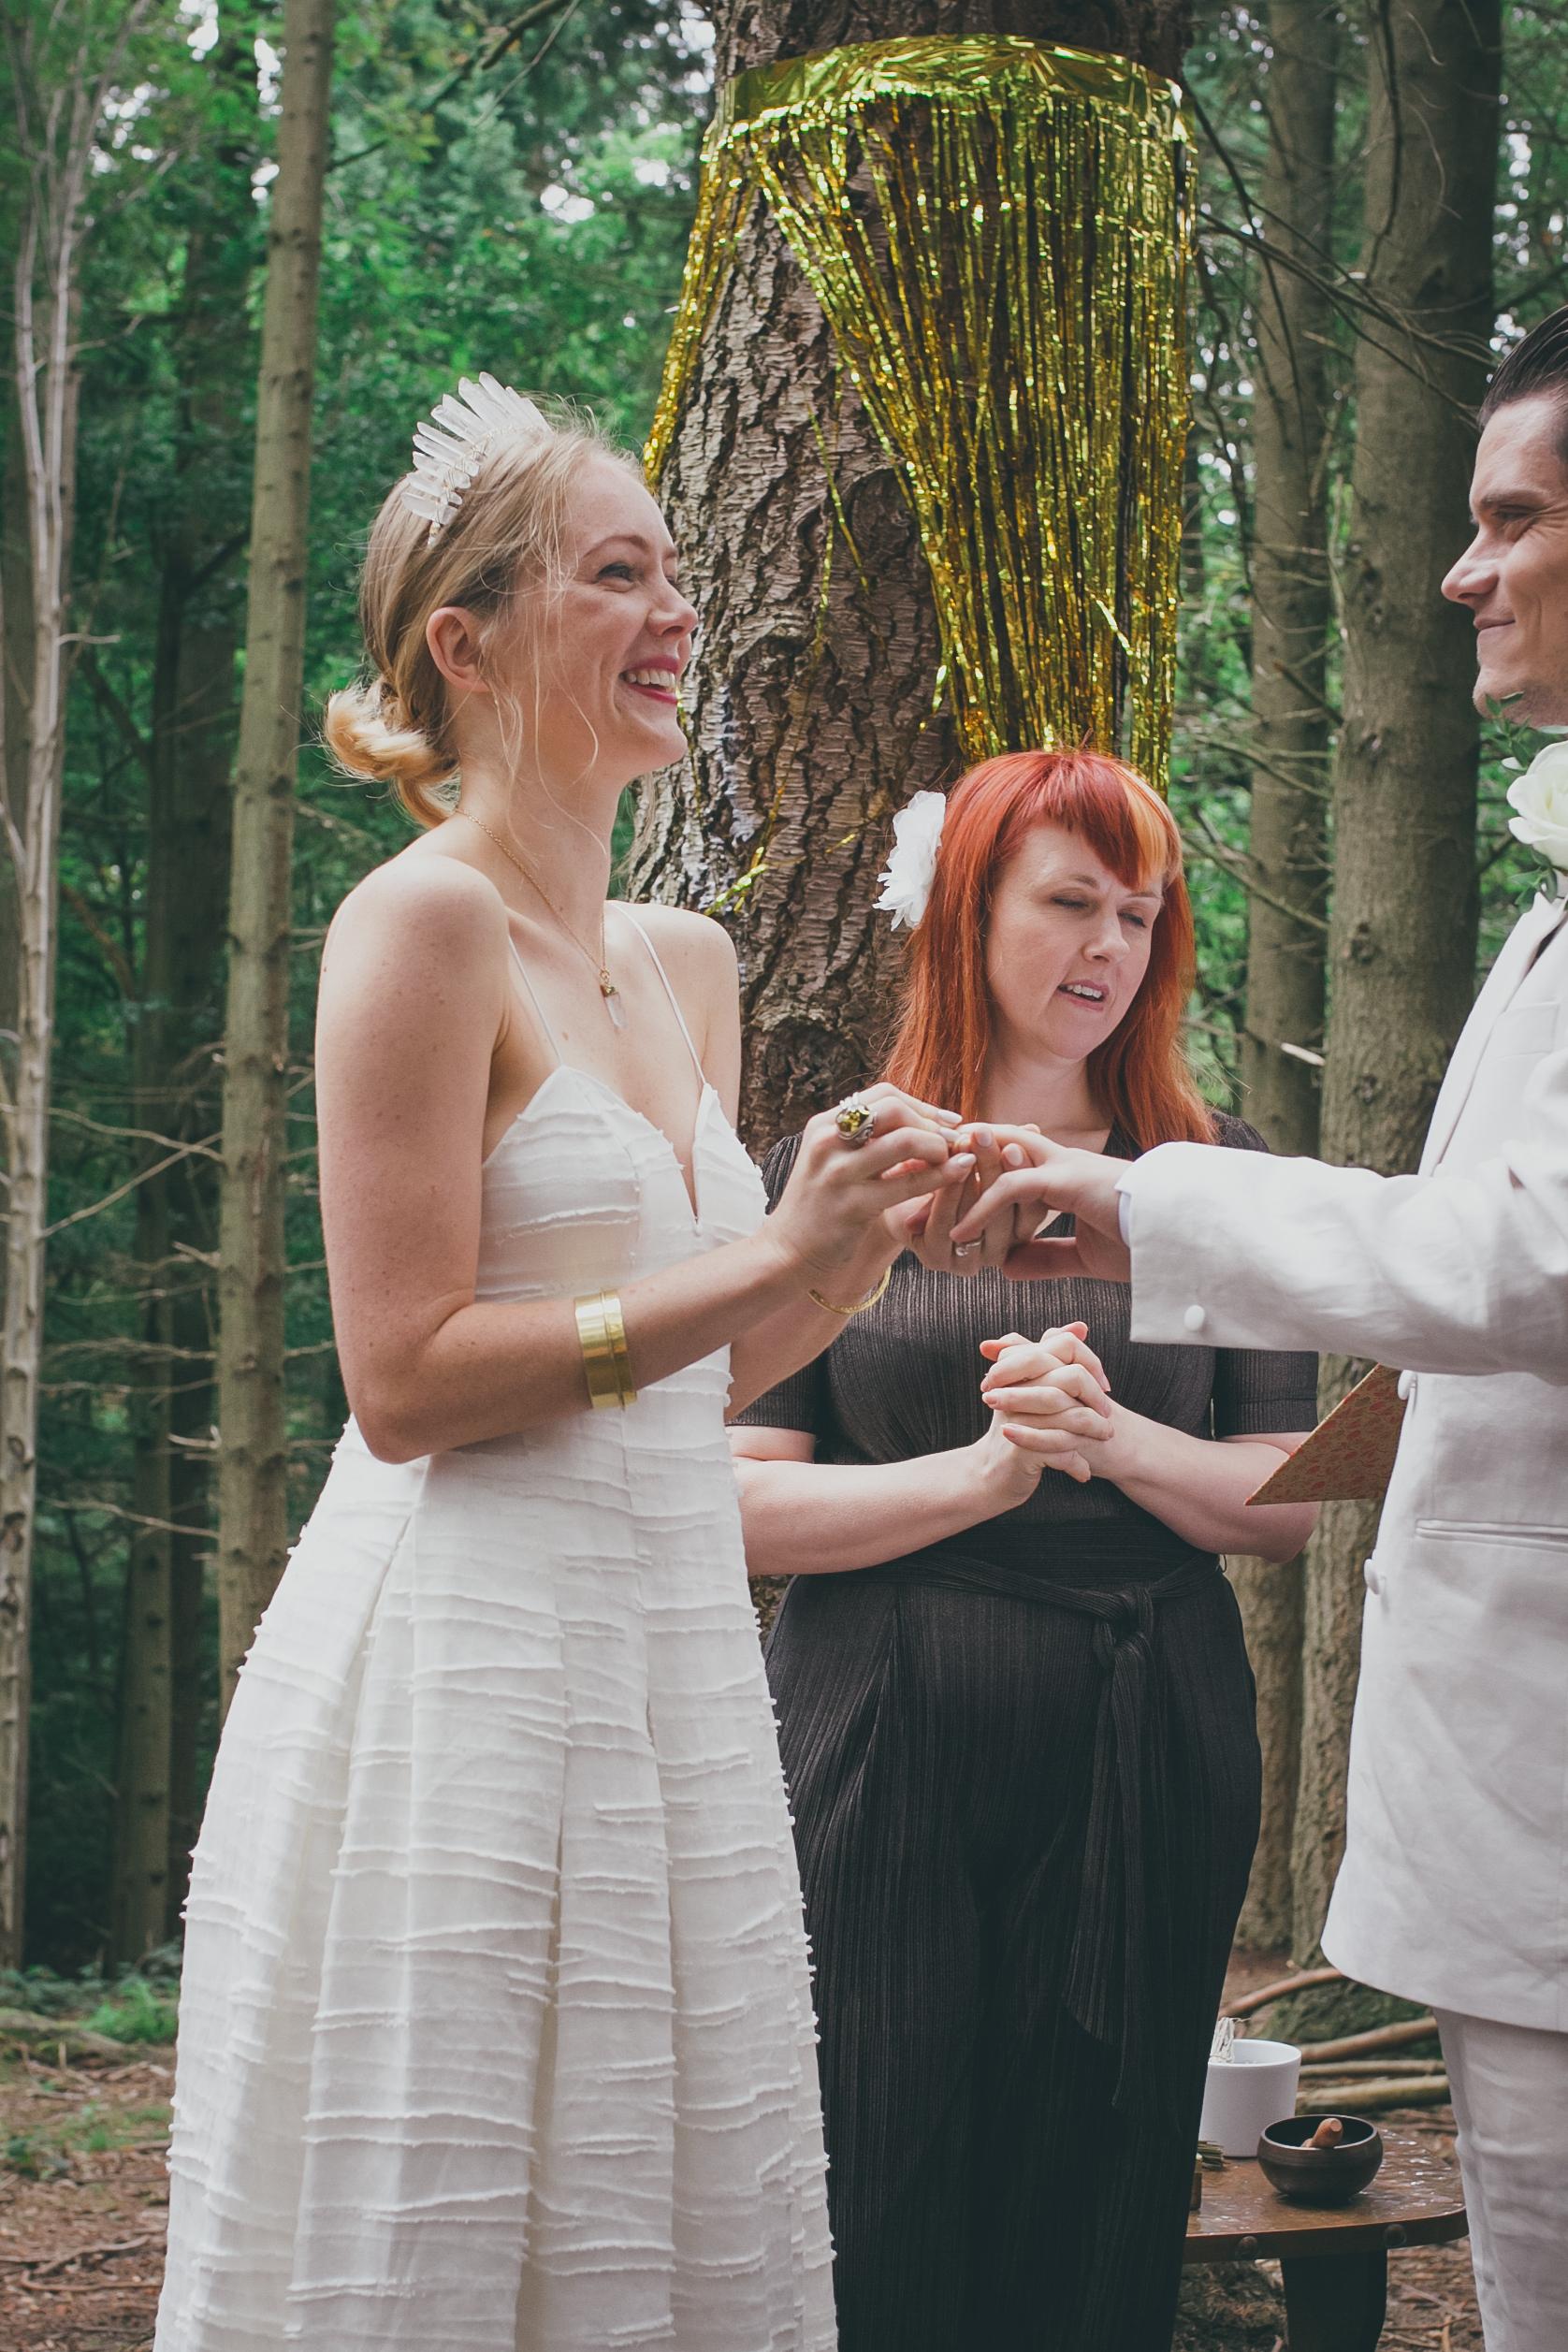 2017-08-19 14.55.37.jpgMagical Forest Wedding - Carolyn Carter photography